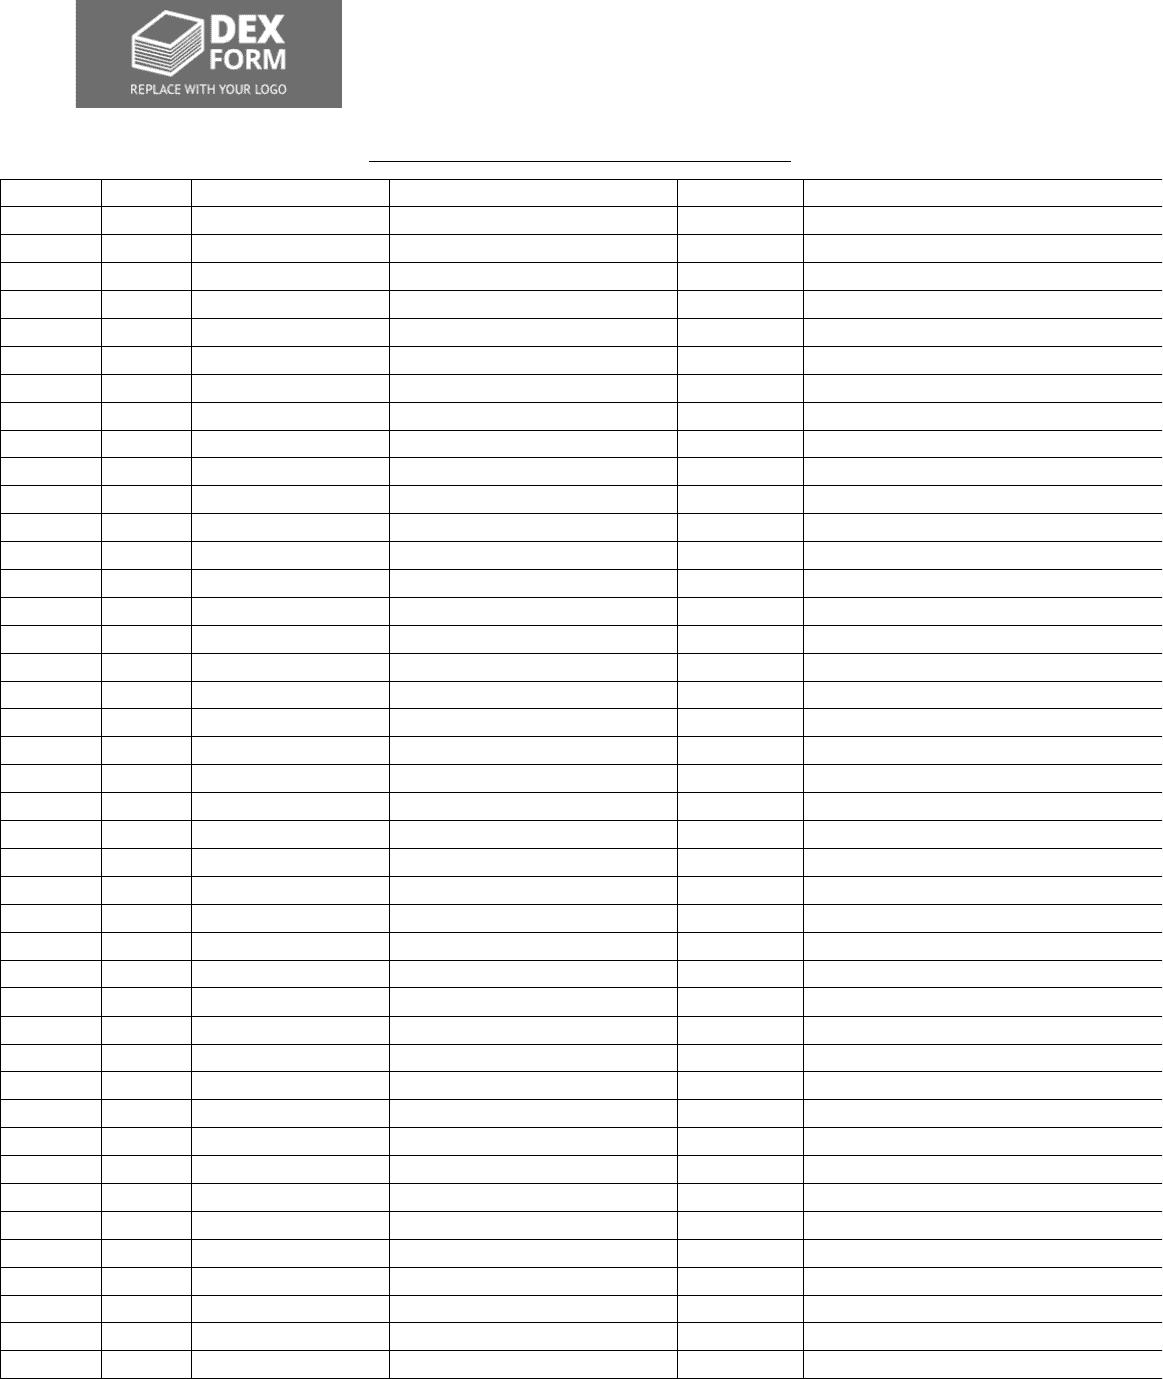 lockout-tagout-form_bg2 Oem Letter Template on sample request, sample business, basic cover, sample resignation,